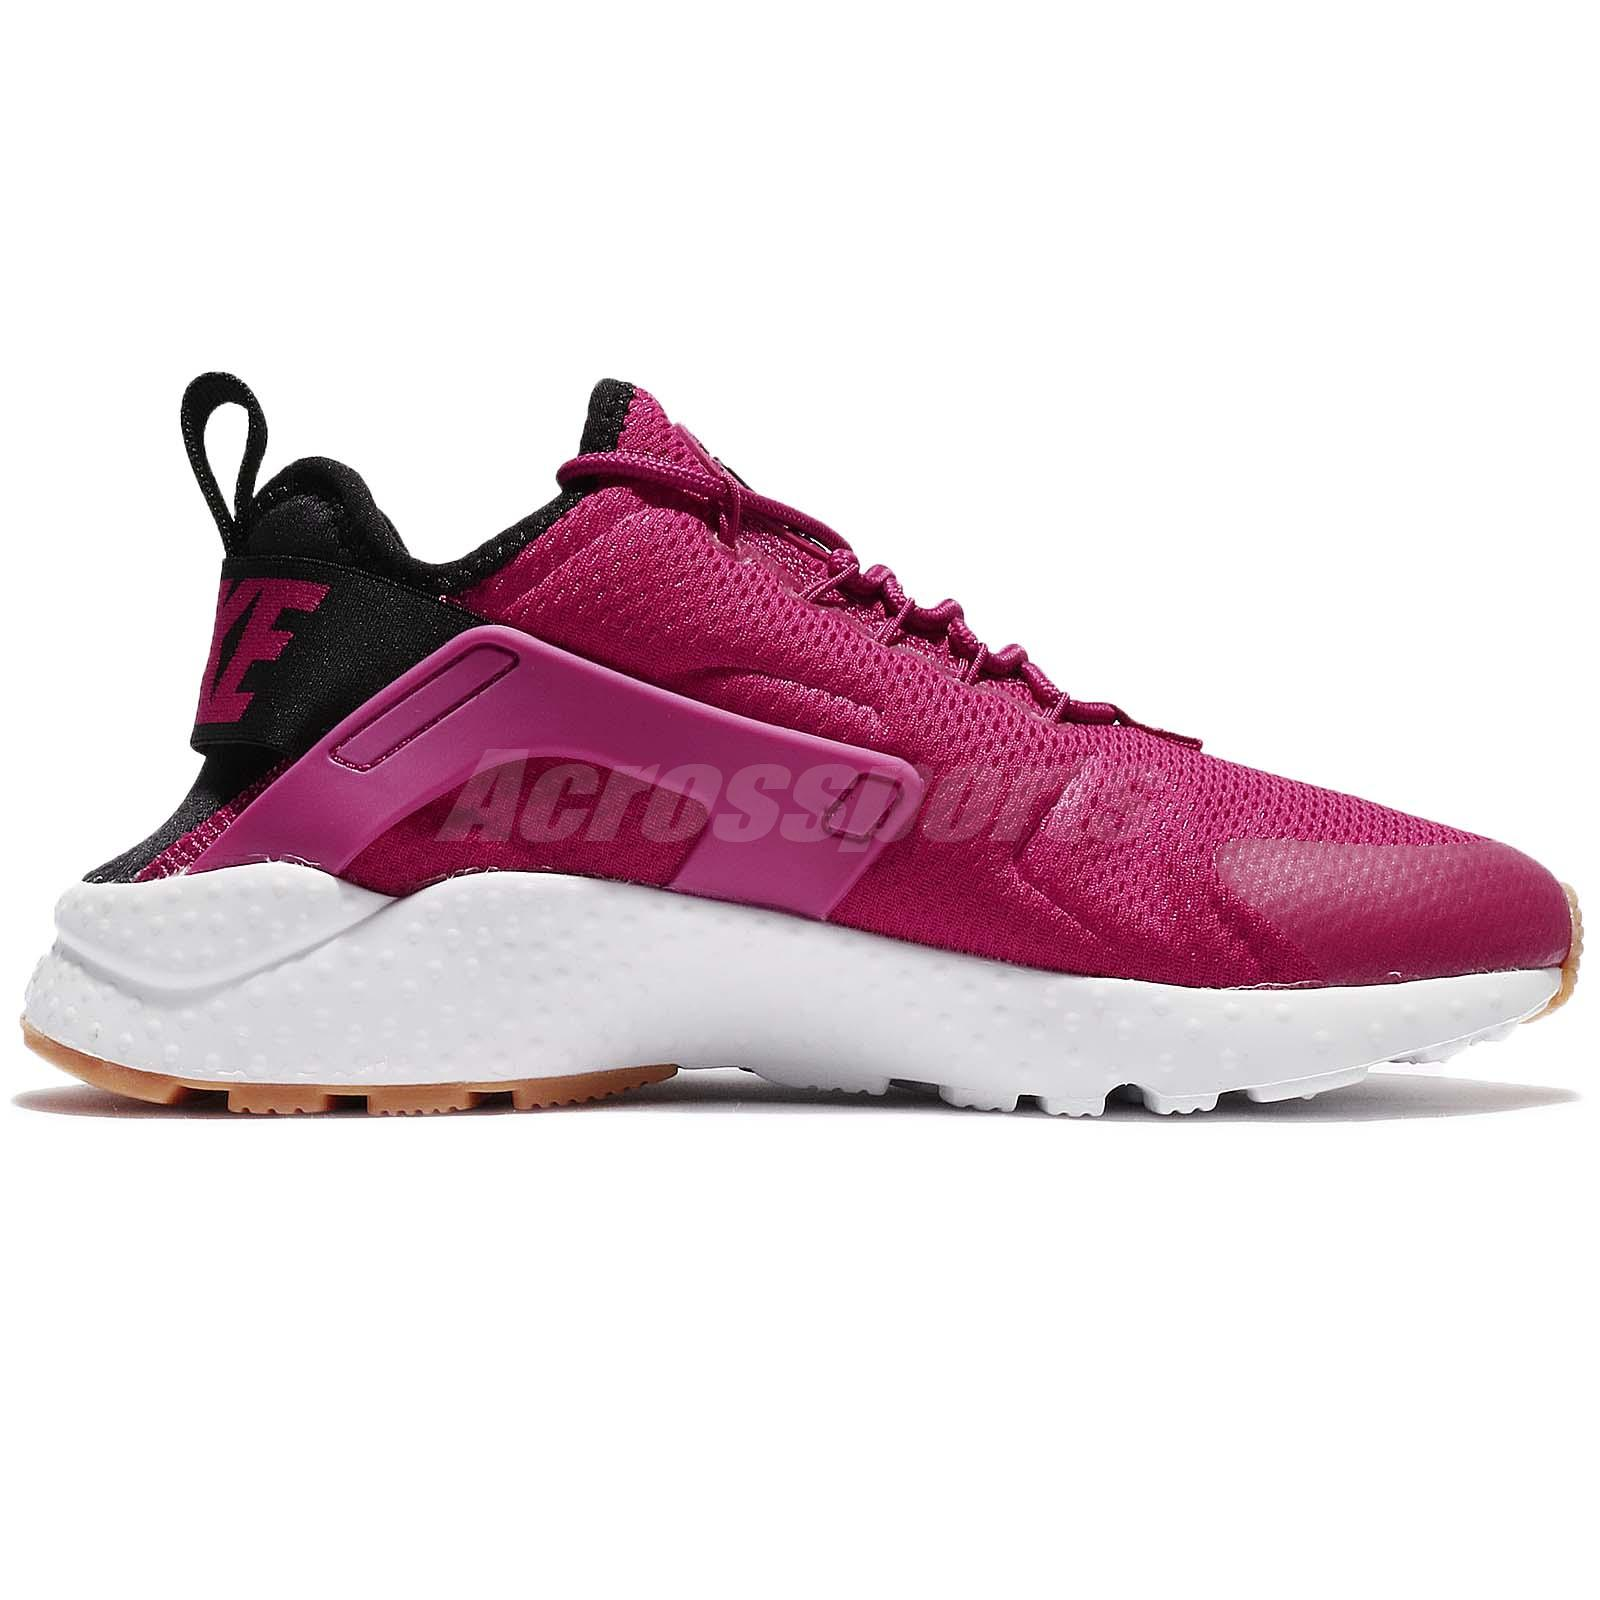 7a9c06f0dacd Wmns Nike Air Huarache Run Ultra Sport Fuchsia Women Running Shoes ...